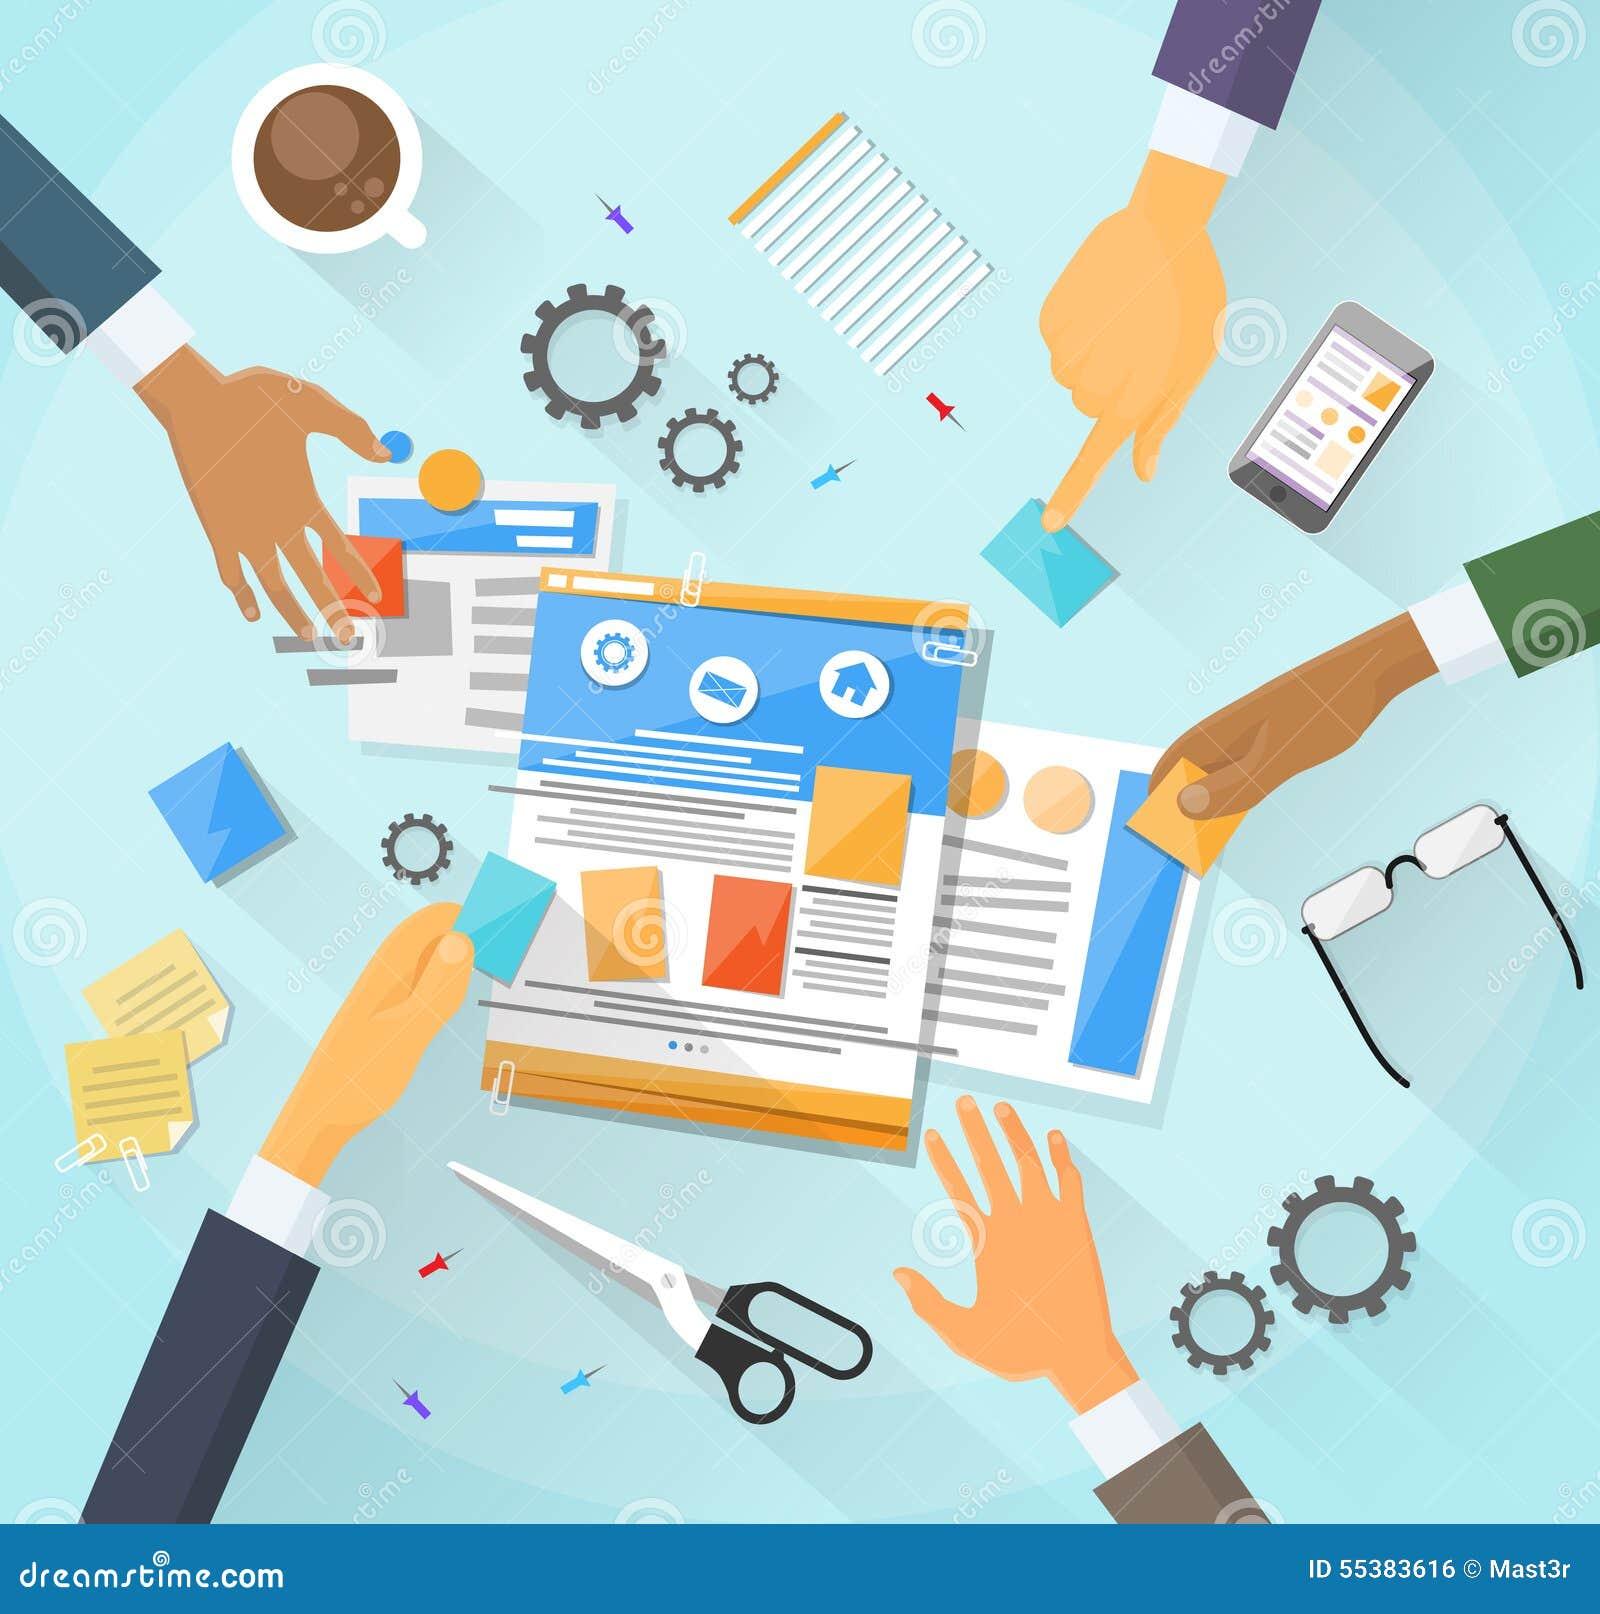 Web Development Create Design Site Building Team